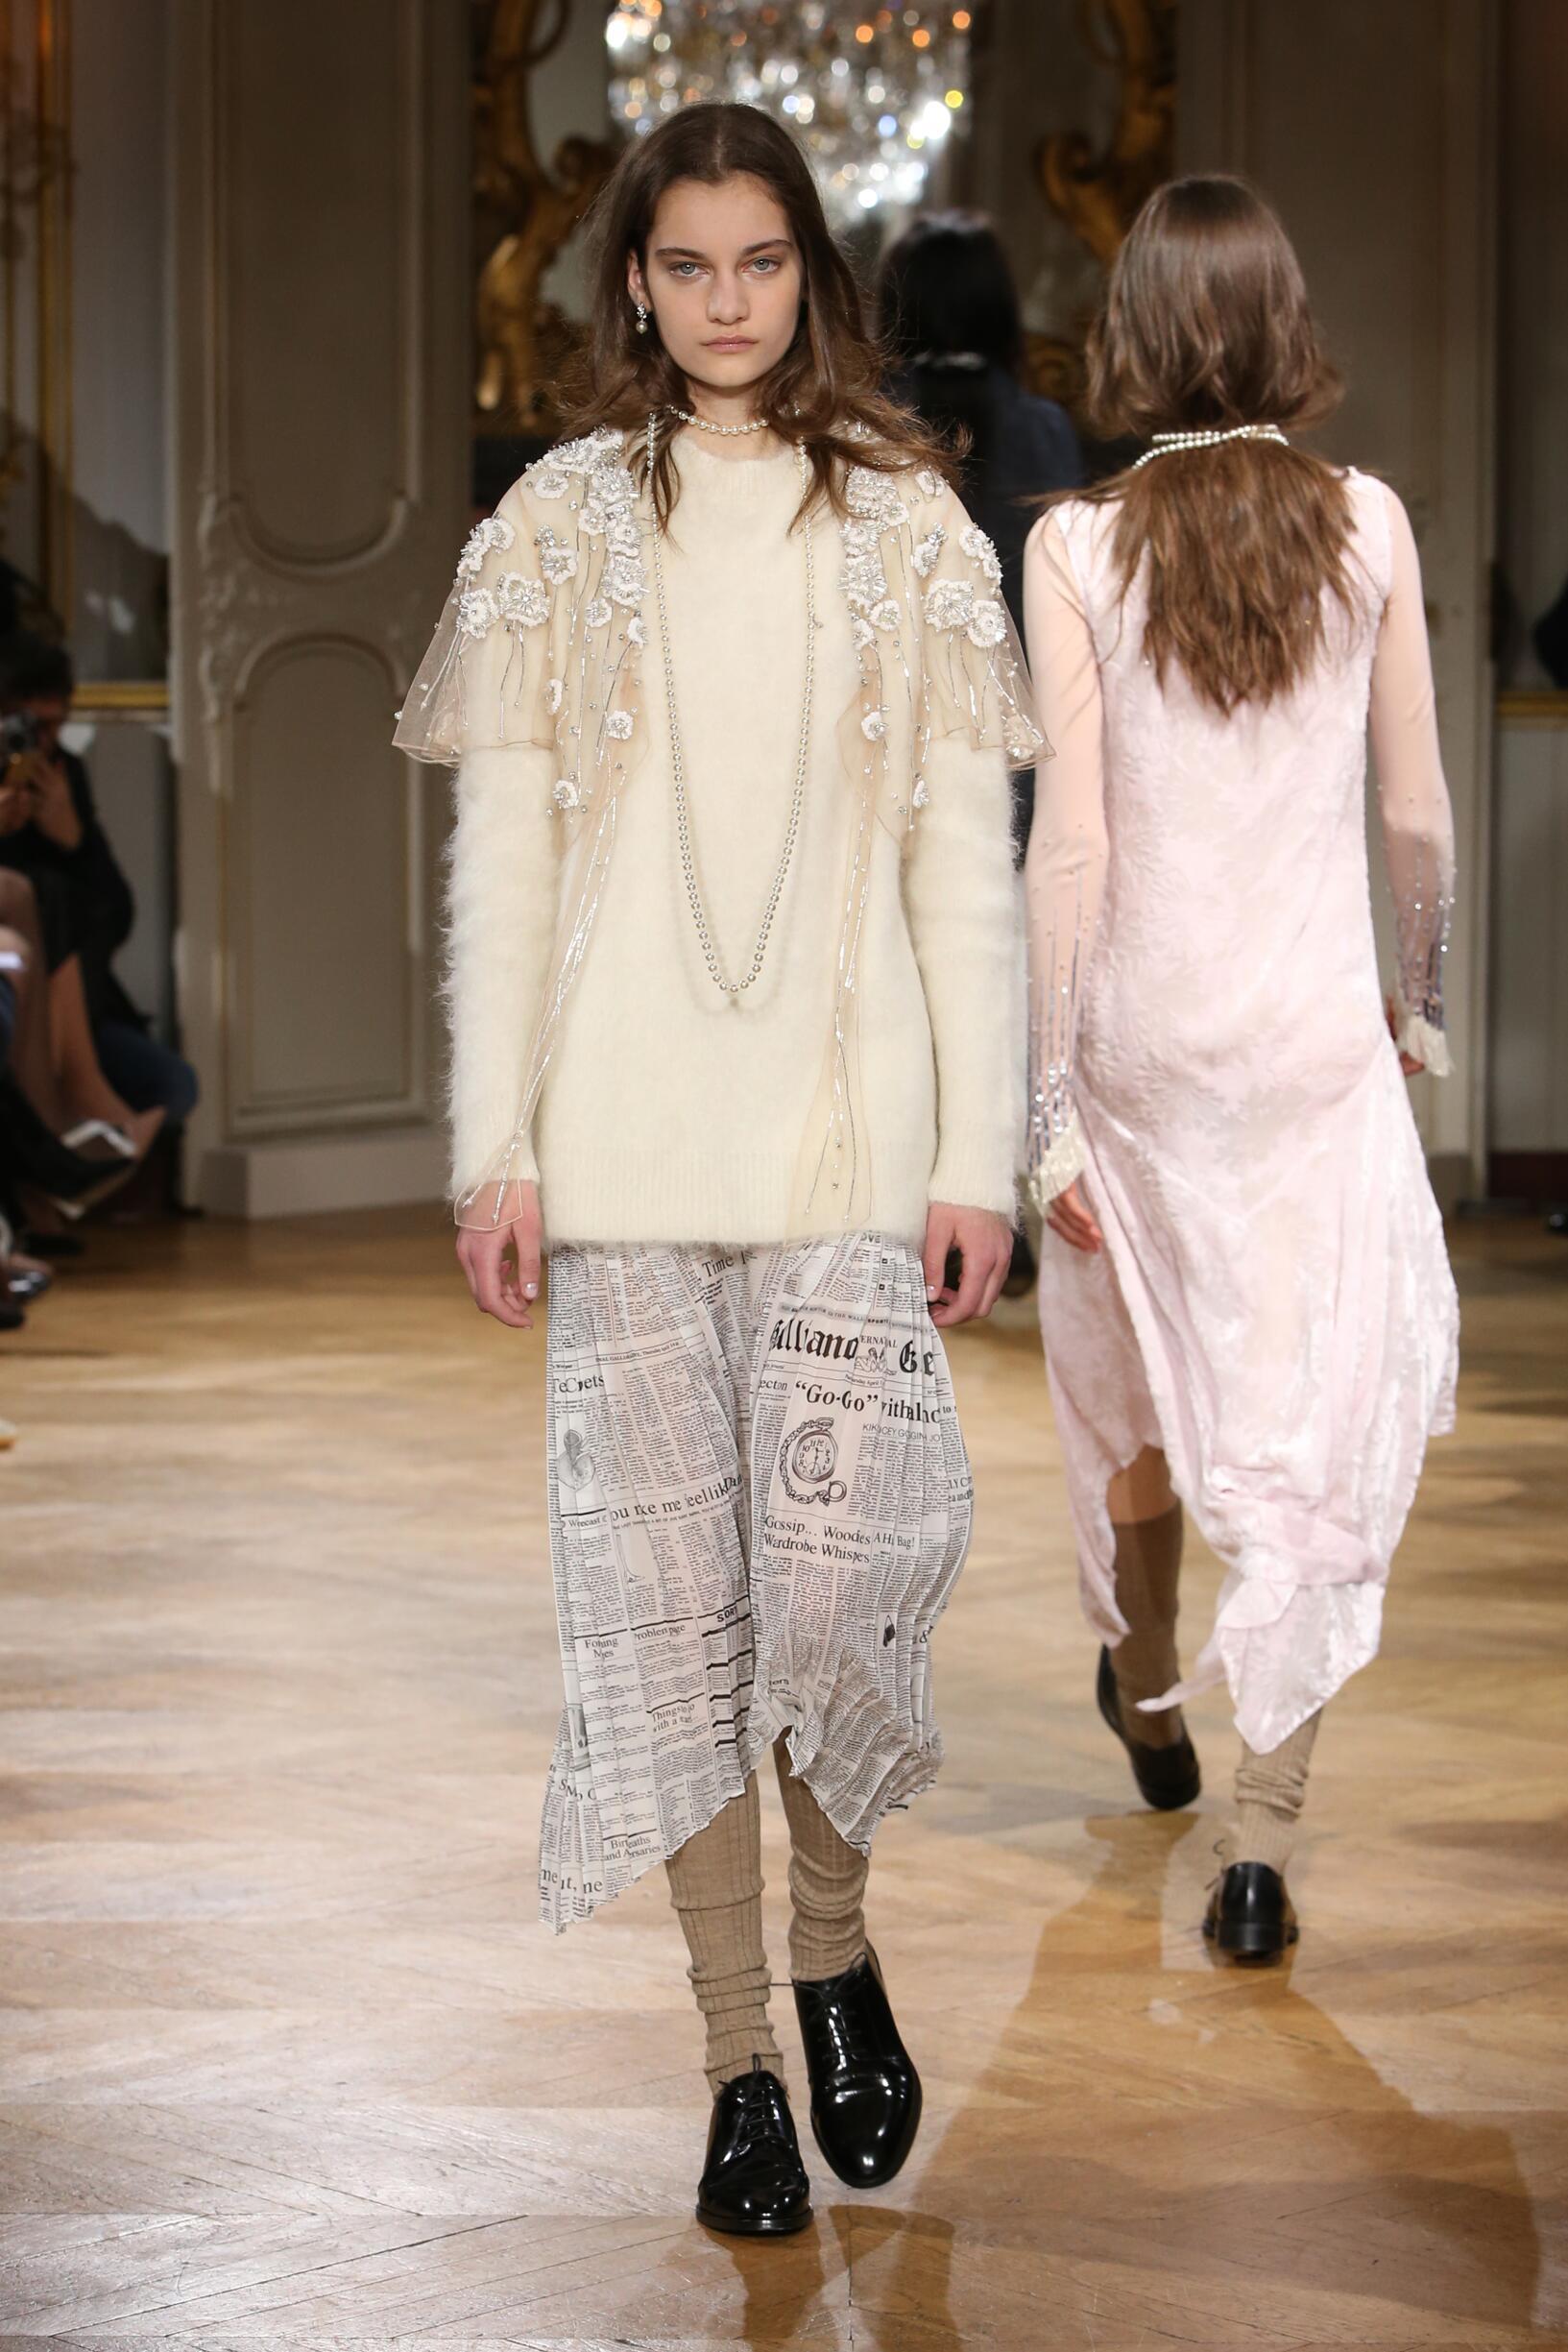 Fashion Woman Model John Galliano Catwalk